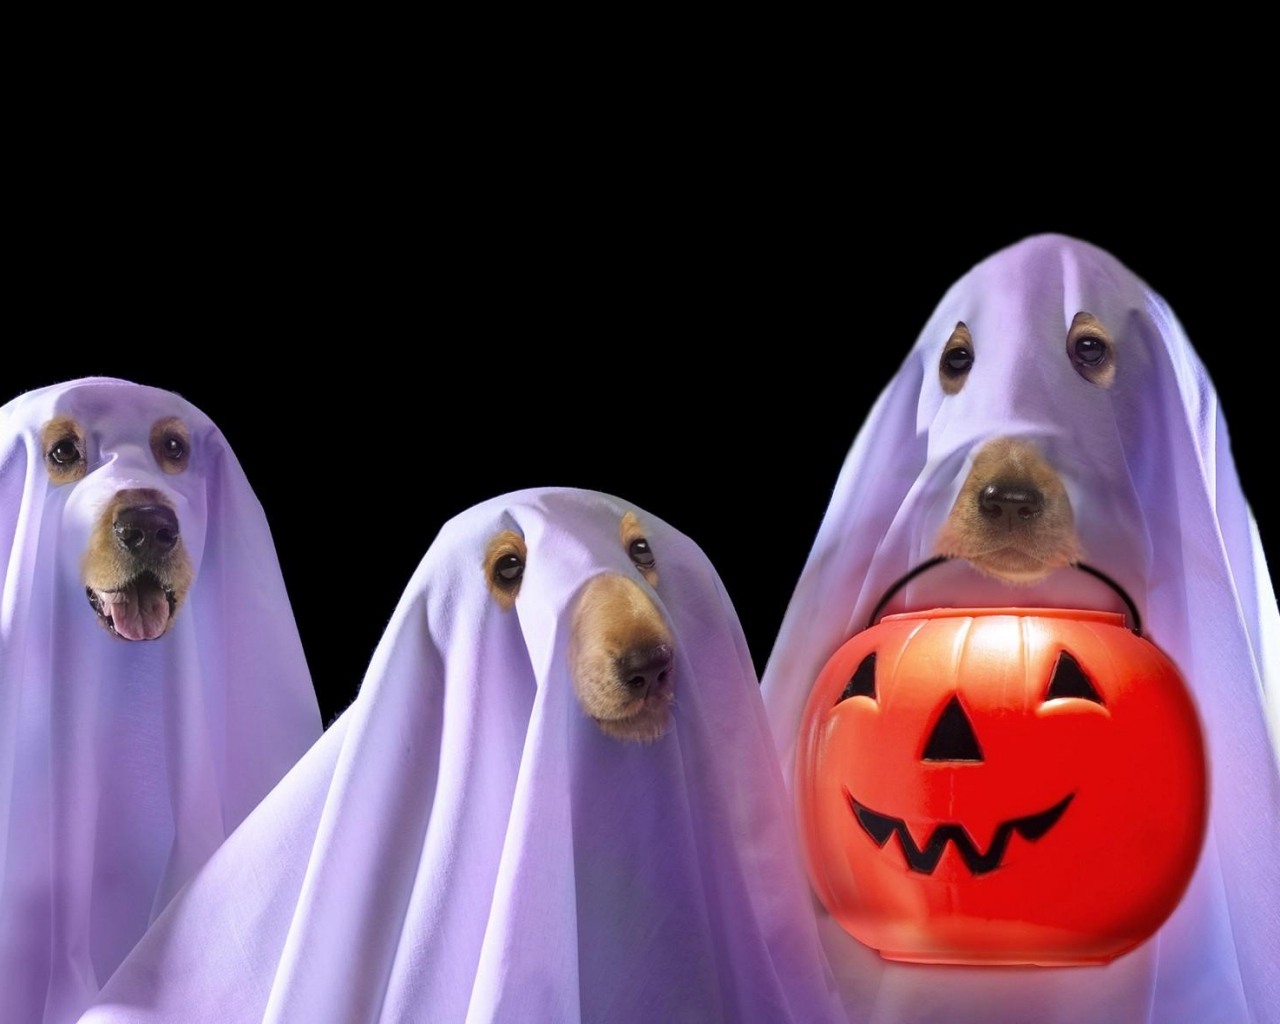 halloween_holiday_dog_bring_lantern_40973_1280x1024